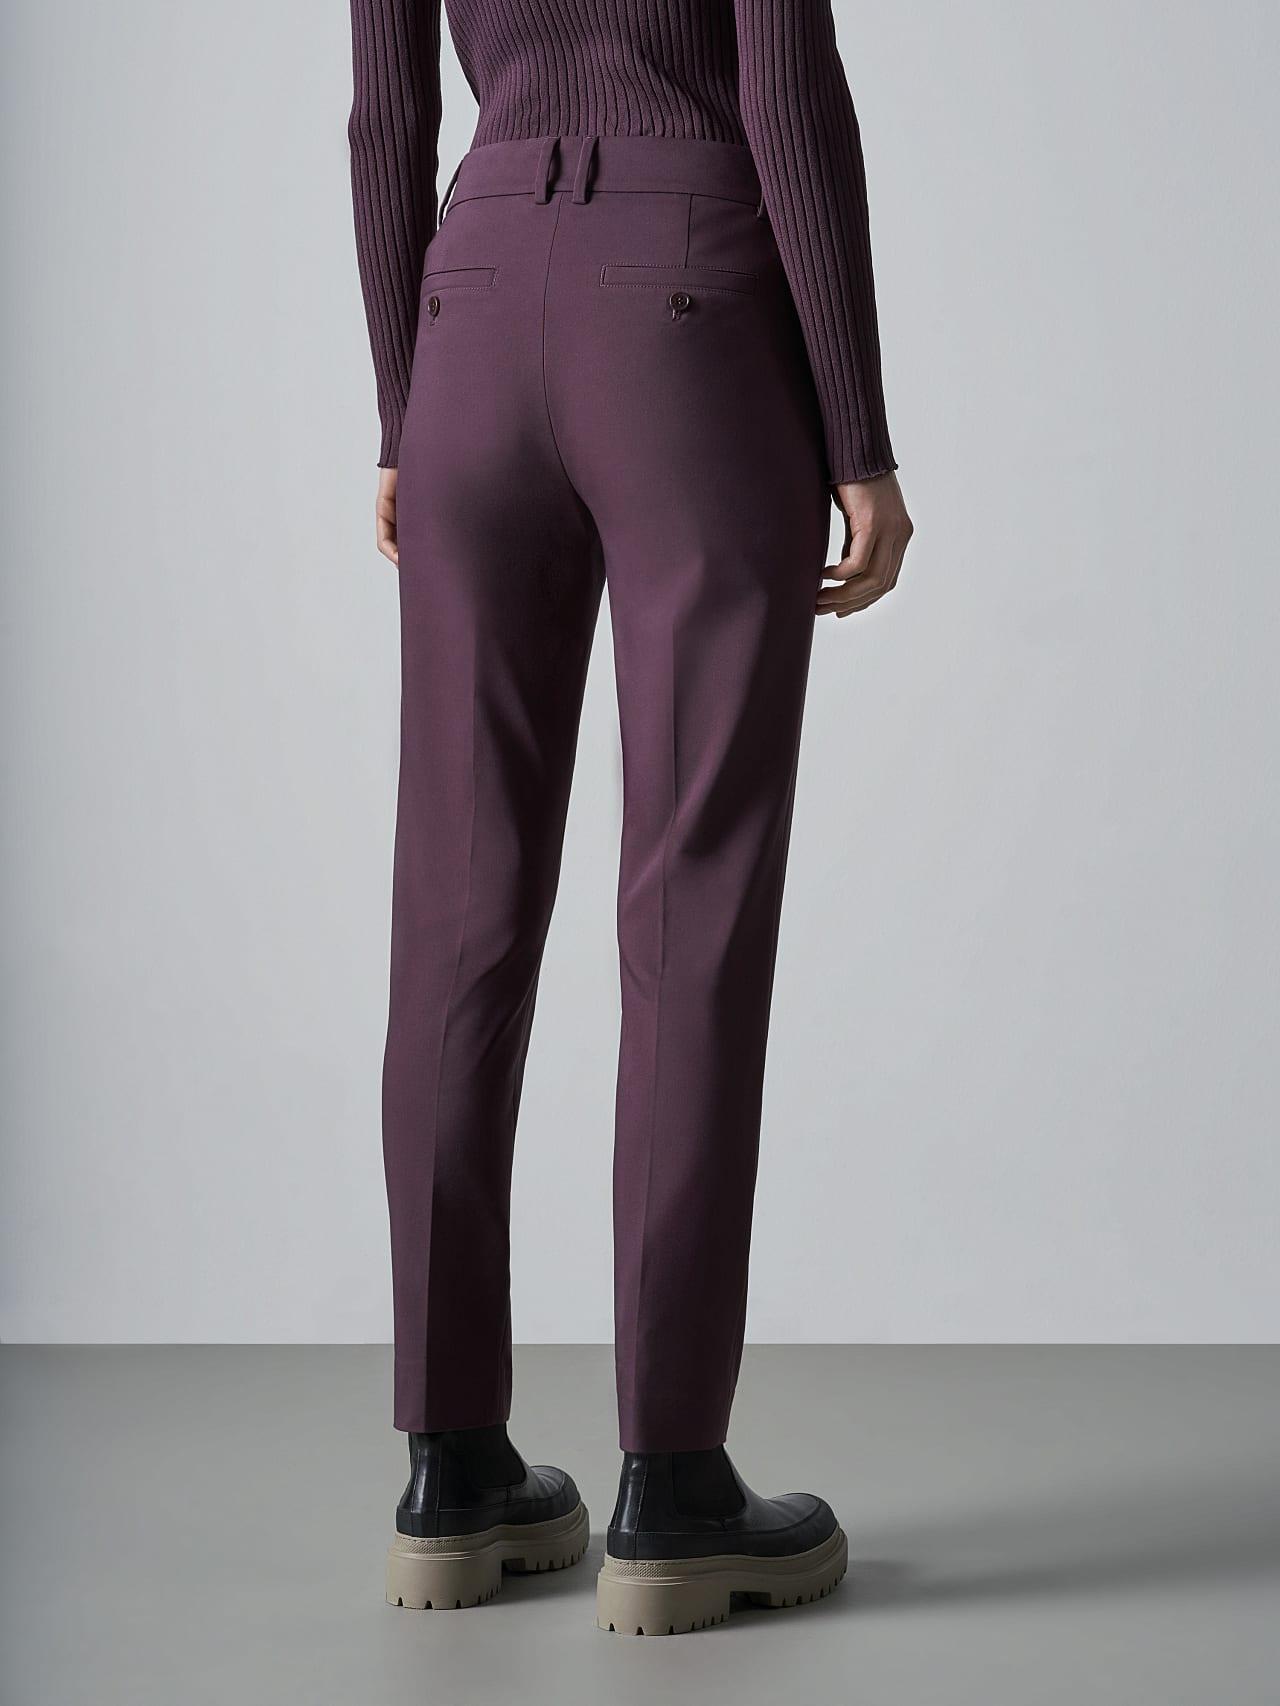 PERTI V1.Y5.02 Slim-Fit Tapered Pants Burgundy Front Main Alpha Tauri